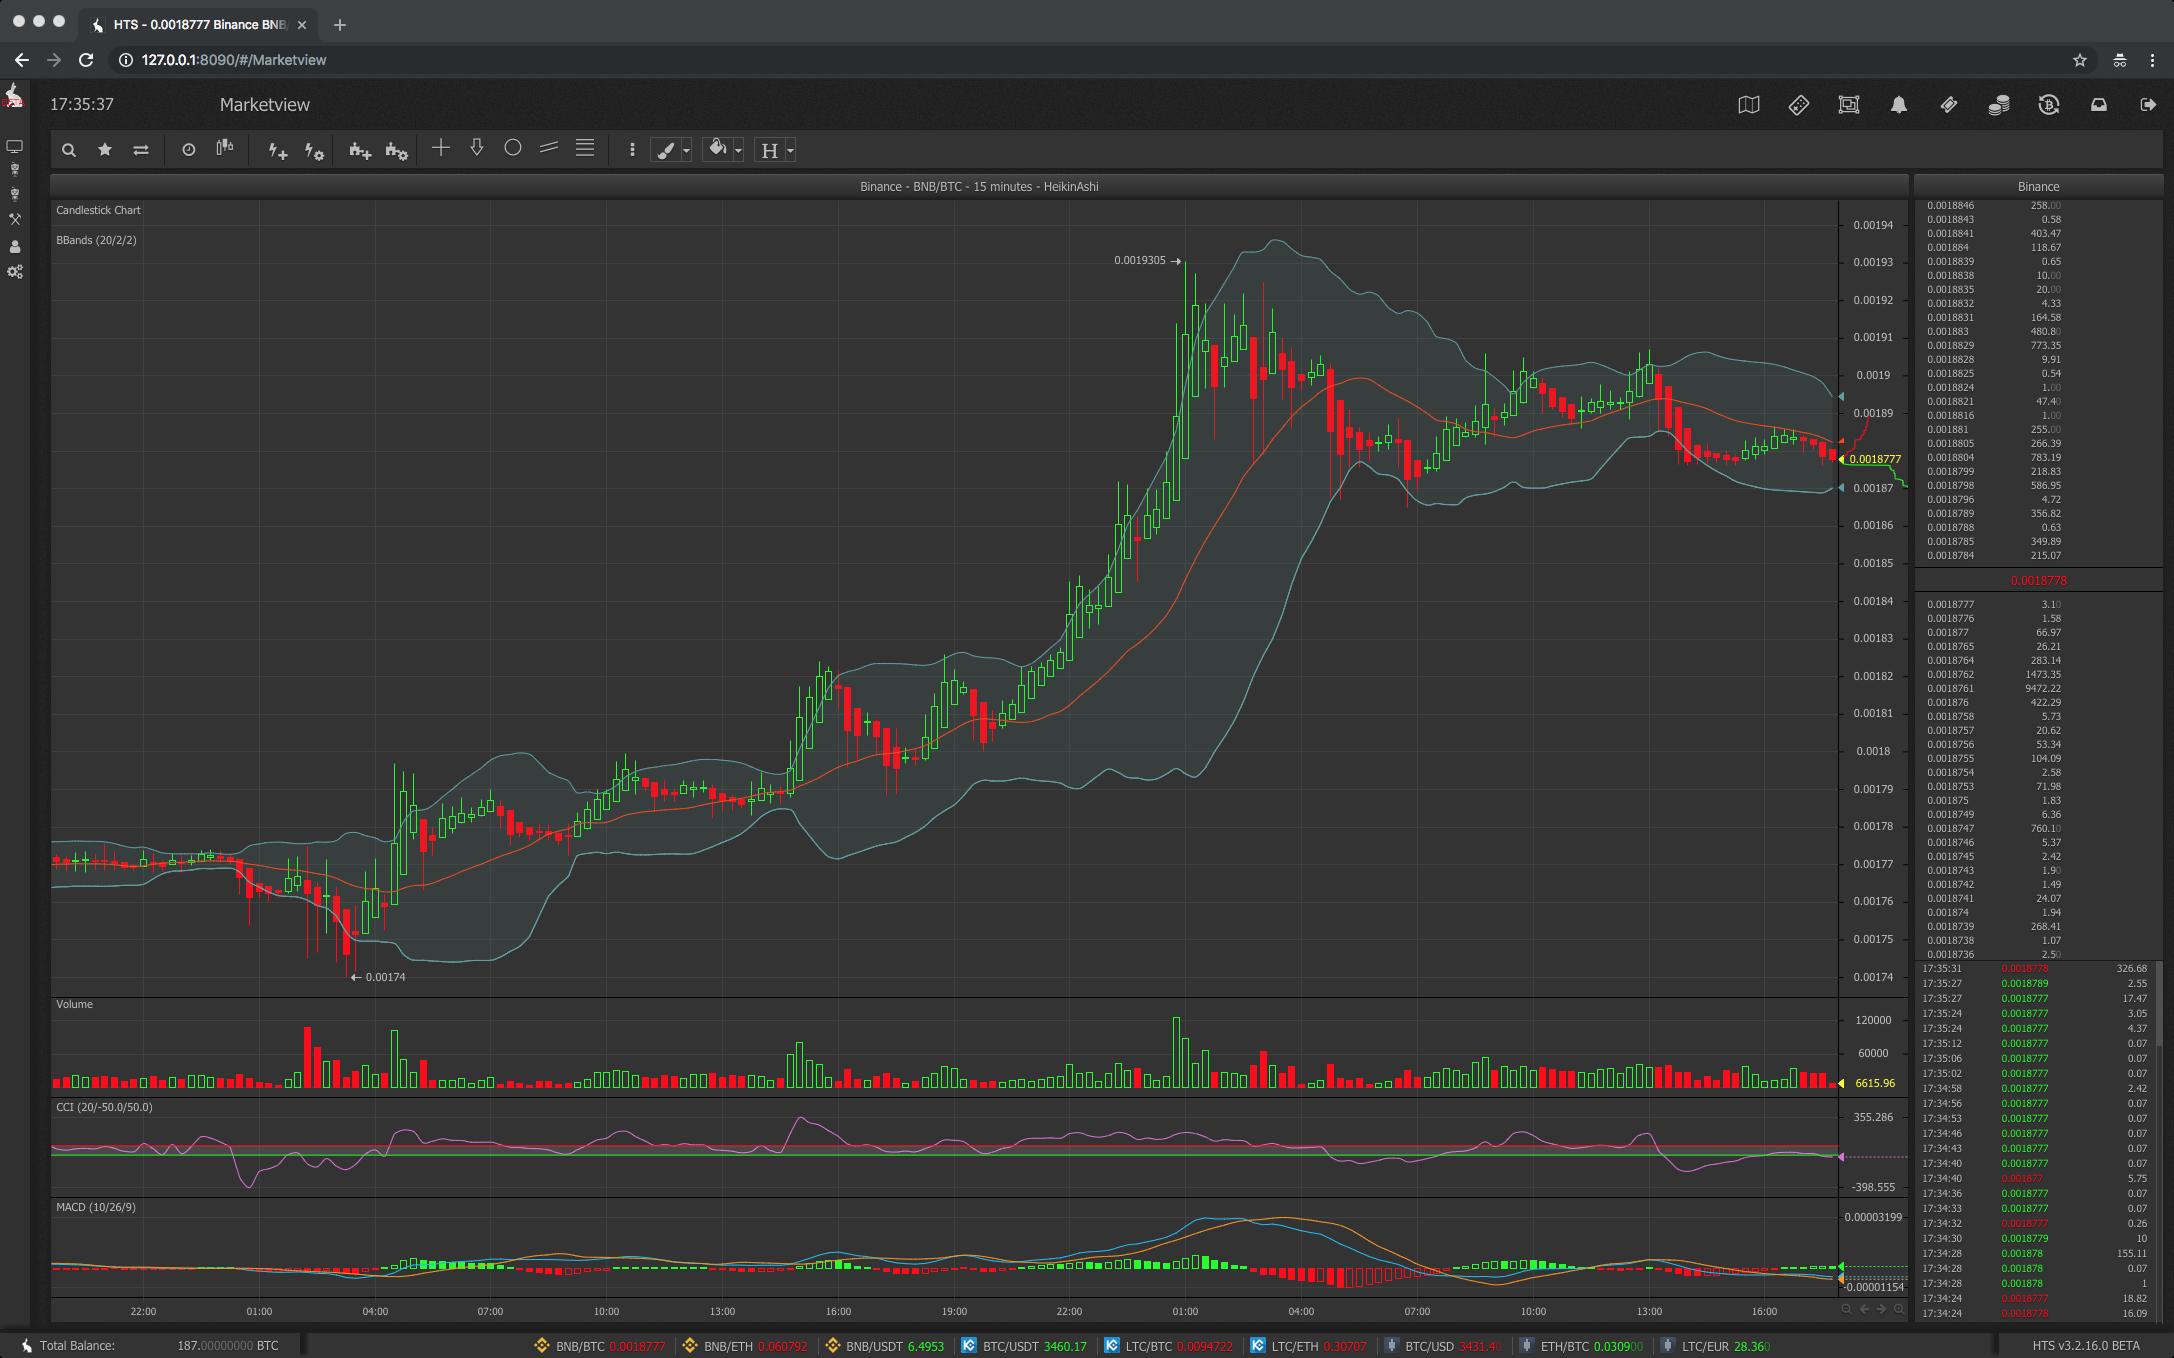 Binance Trading Bots - HaasOnline